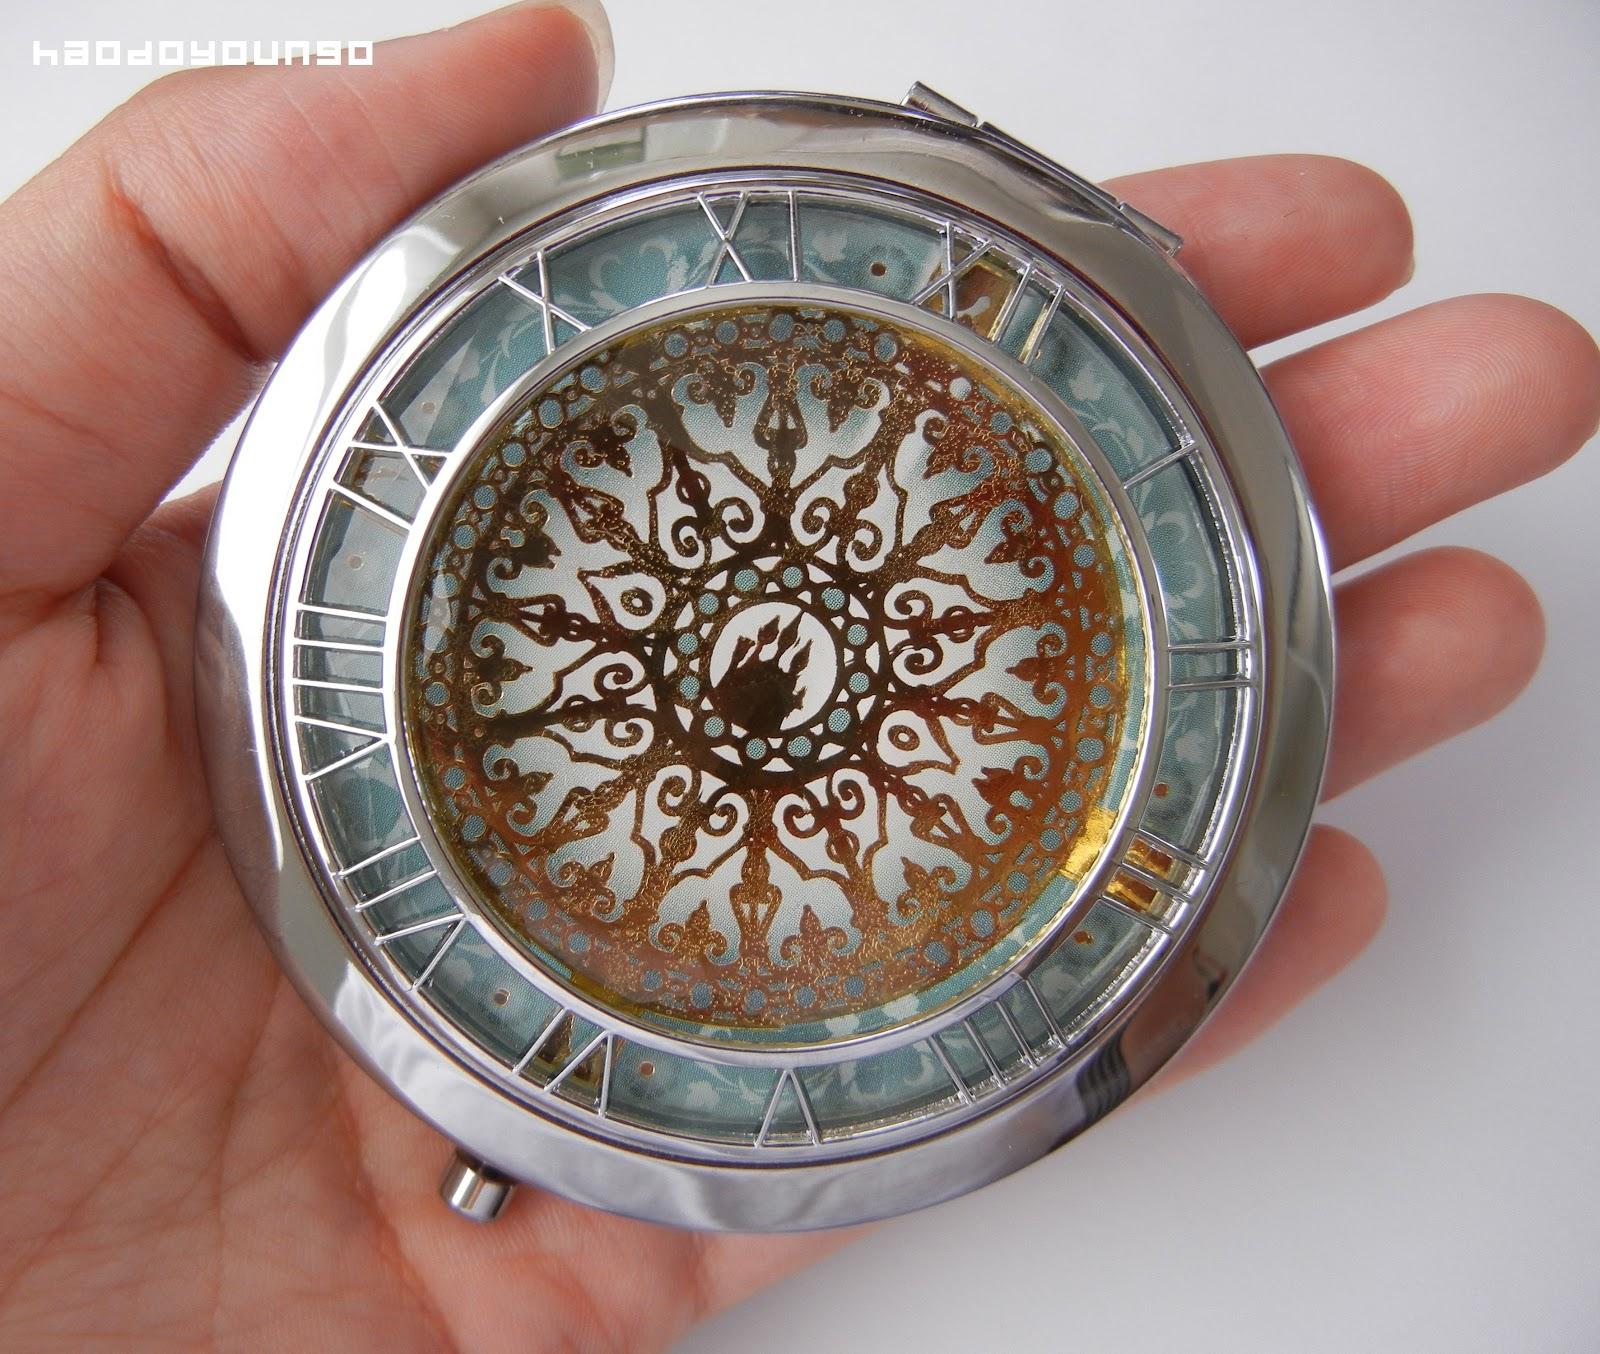 sephora compact mirror. review: disney cinderella collection by sephora compact mirror y